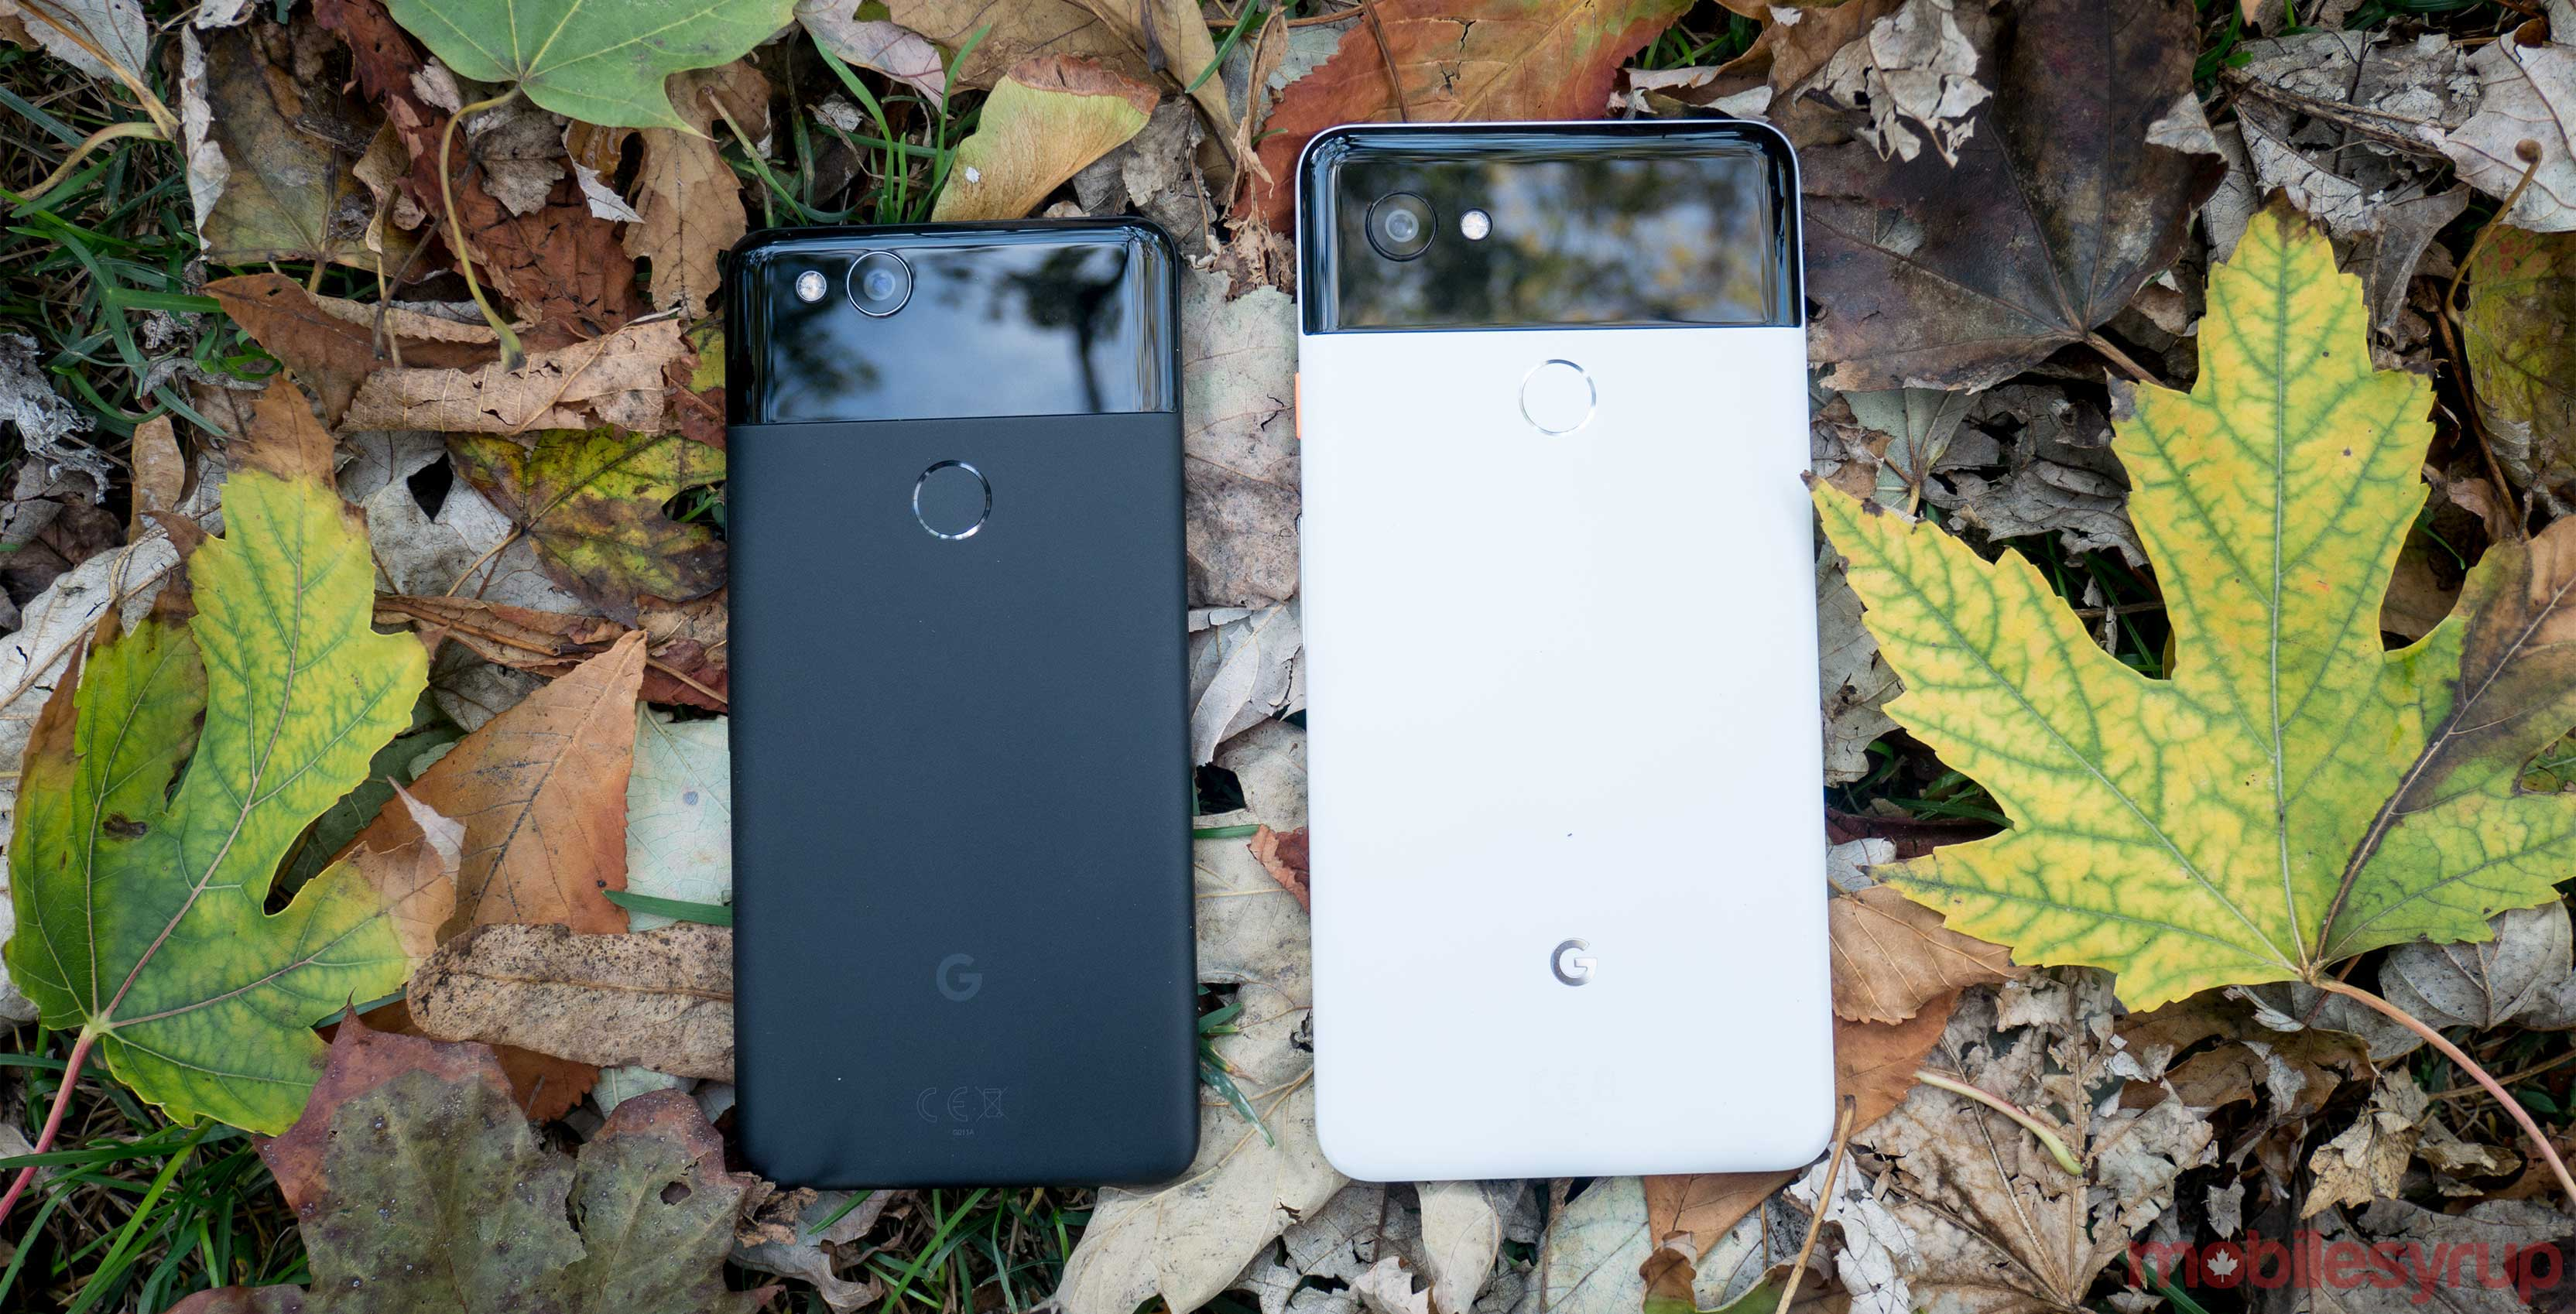 Pixel 2 and Pixel 2 XL